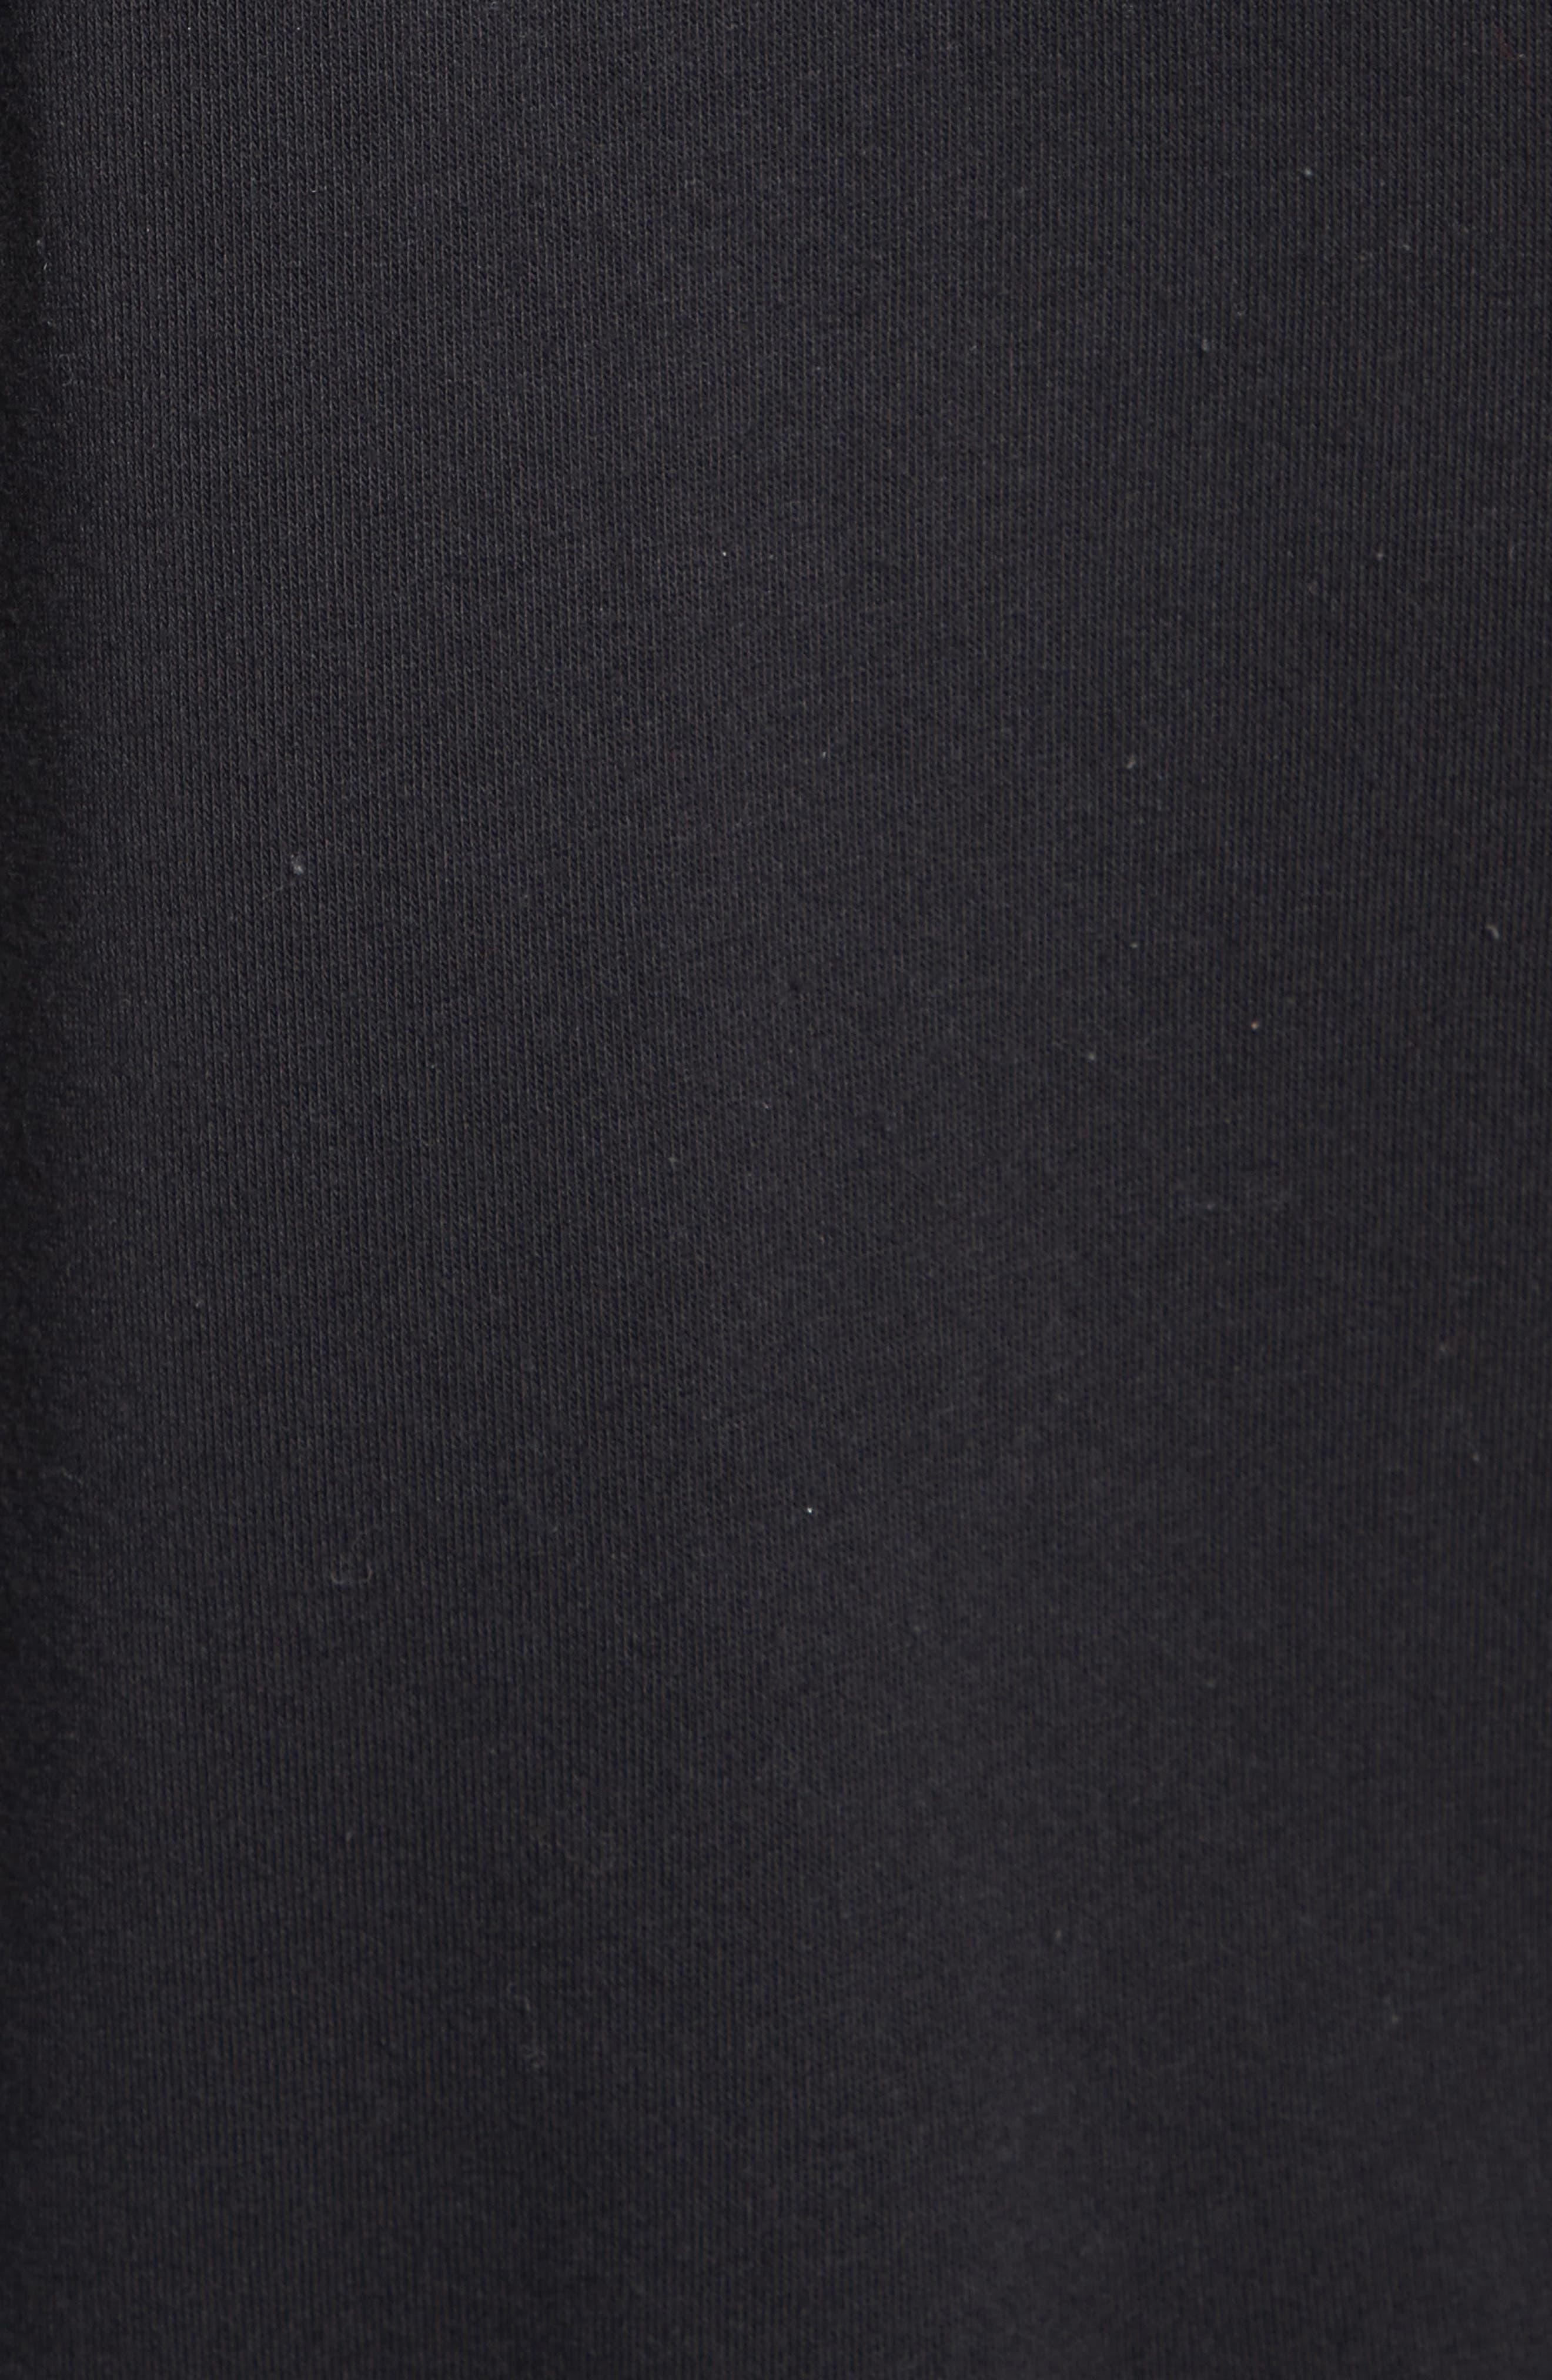 Graham Embellished Sweatshirt,                             Alternate thumbnail 5, color,                             001